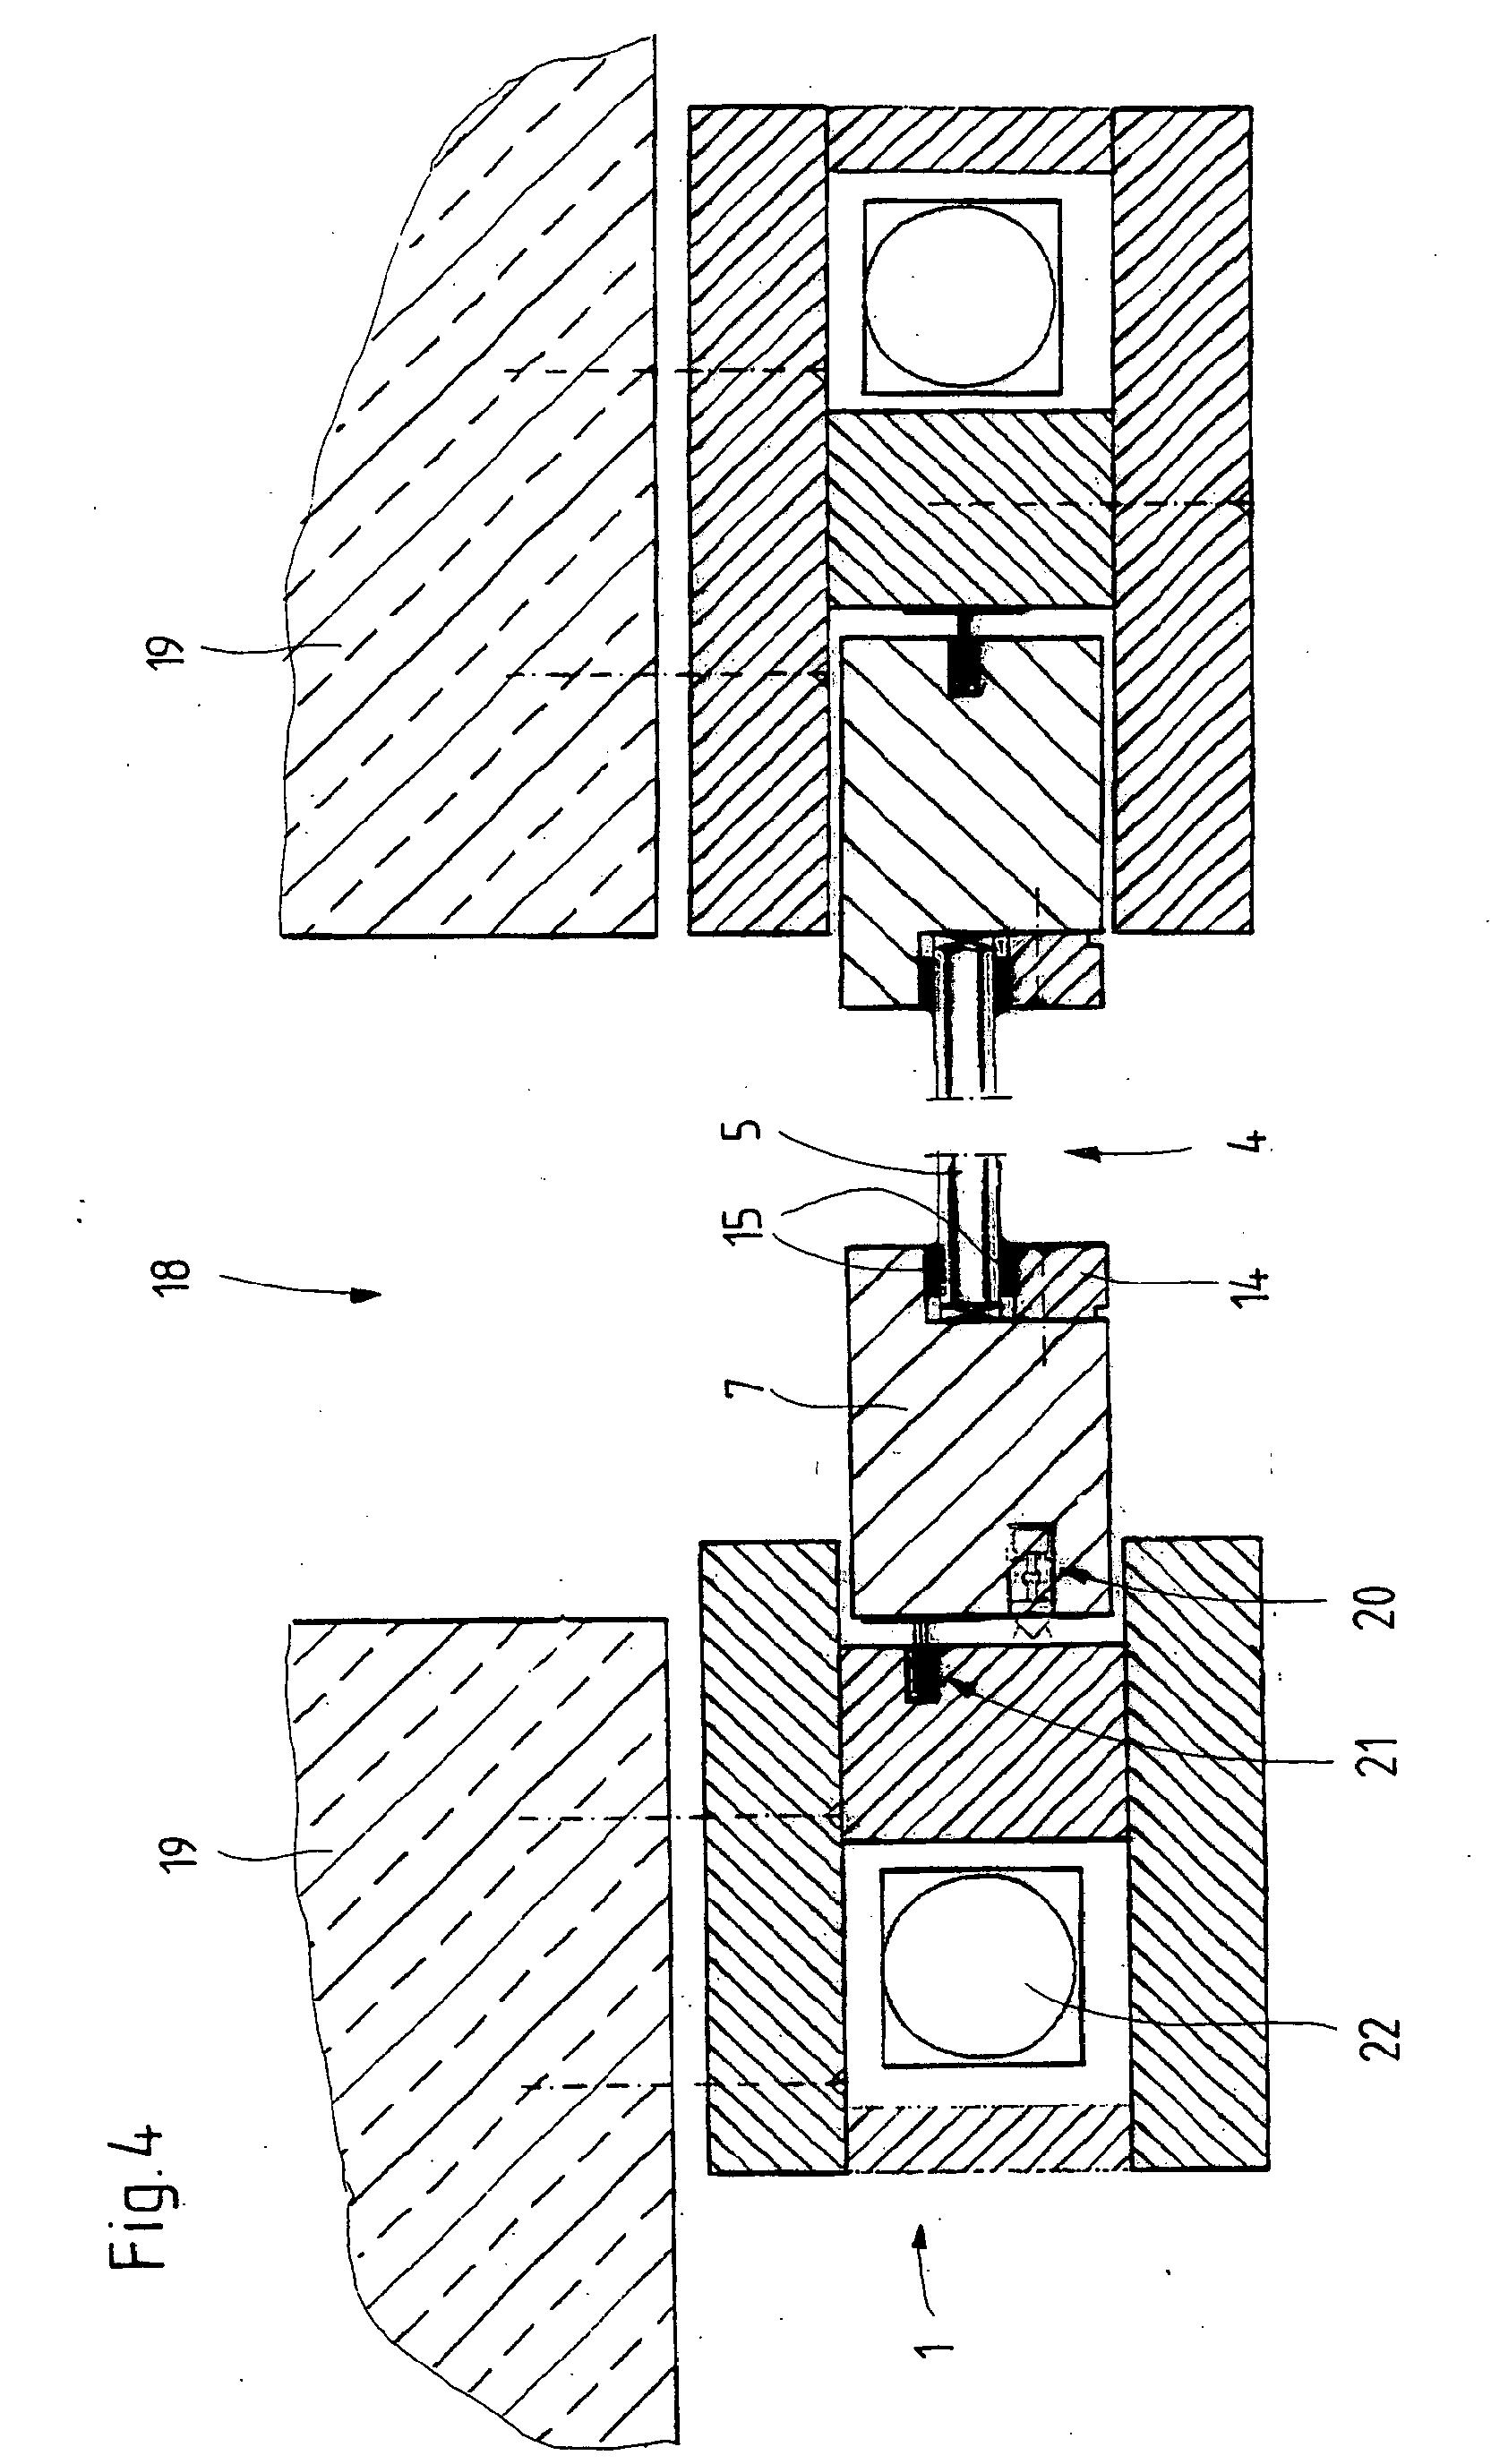 patent ep1637687a2 schiebefenster f r brandschutzzwecke. Black Bedroom Furniture Sets. Home Design Ideas